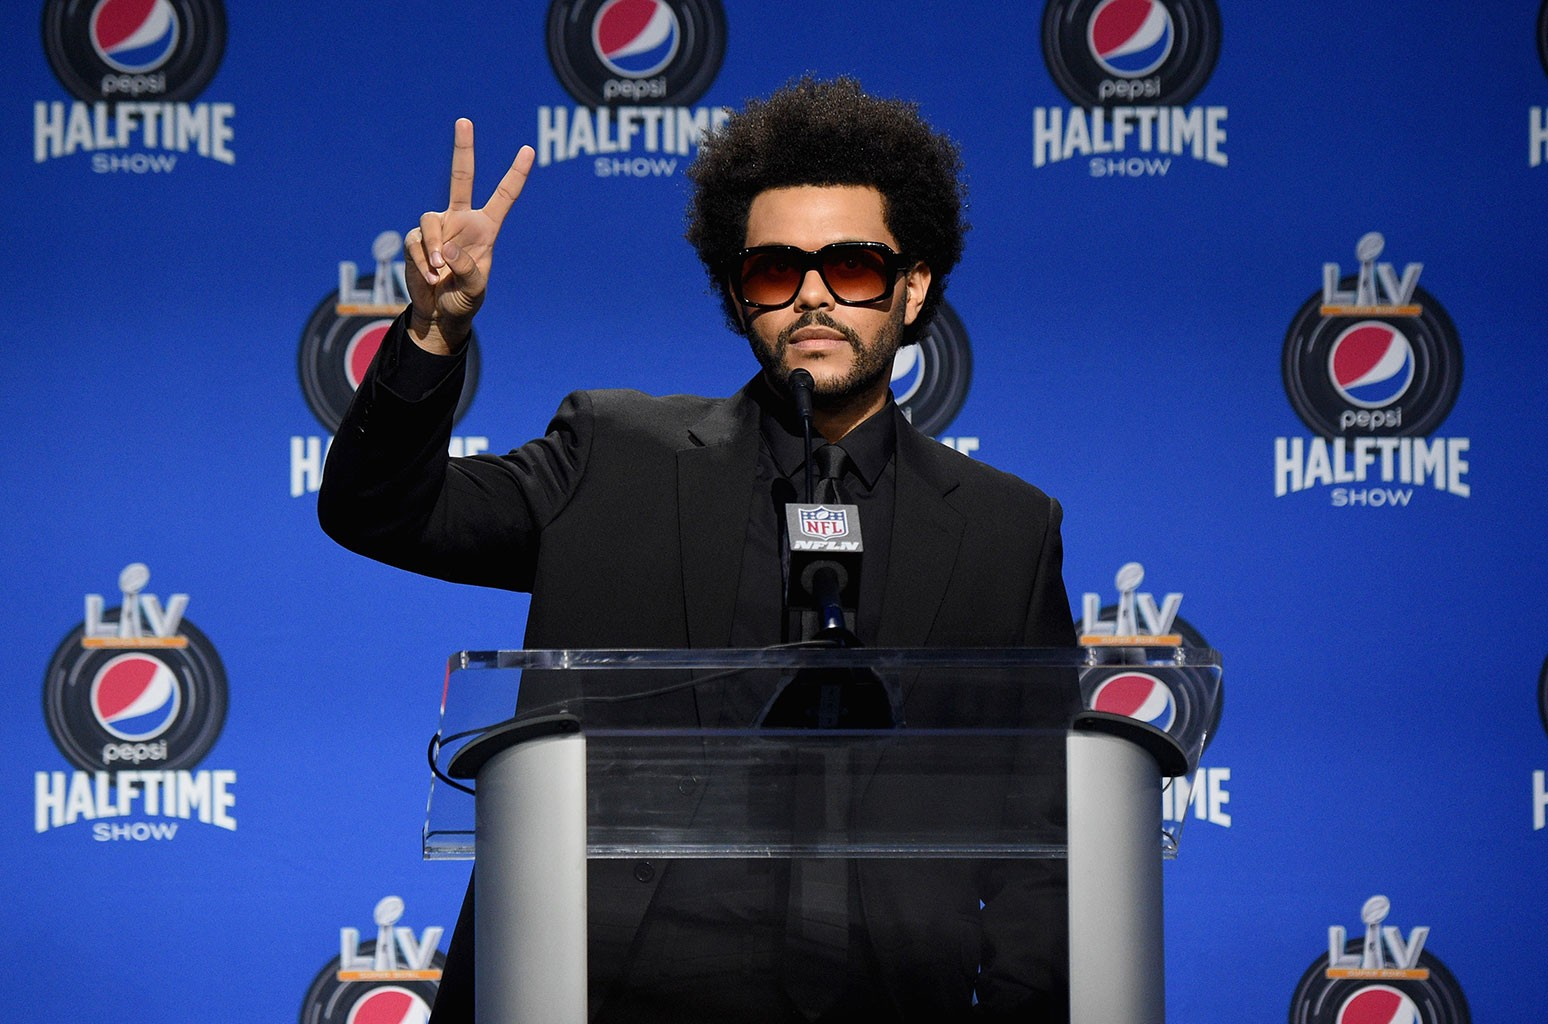 No Lights Too Blinding For The Weeknd With Superstar Set at Super Bowl 2021 Halftime - Billboard